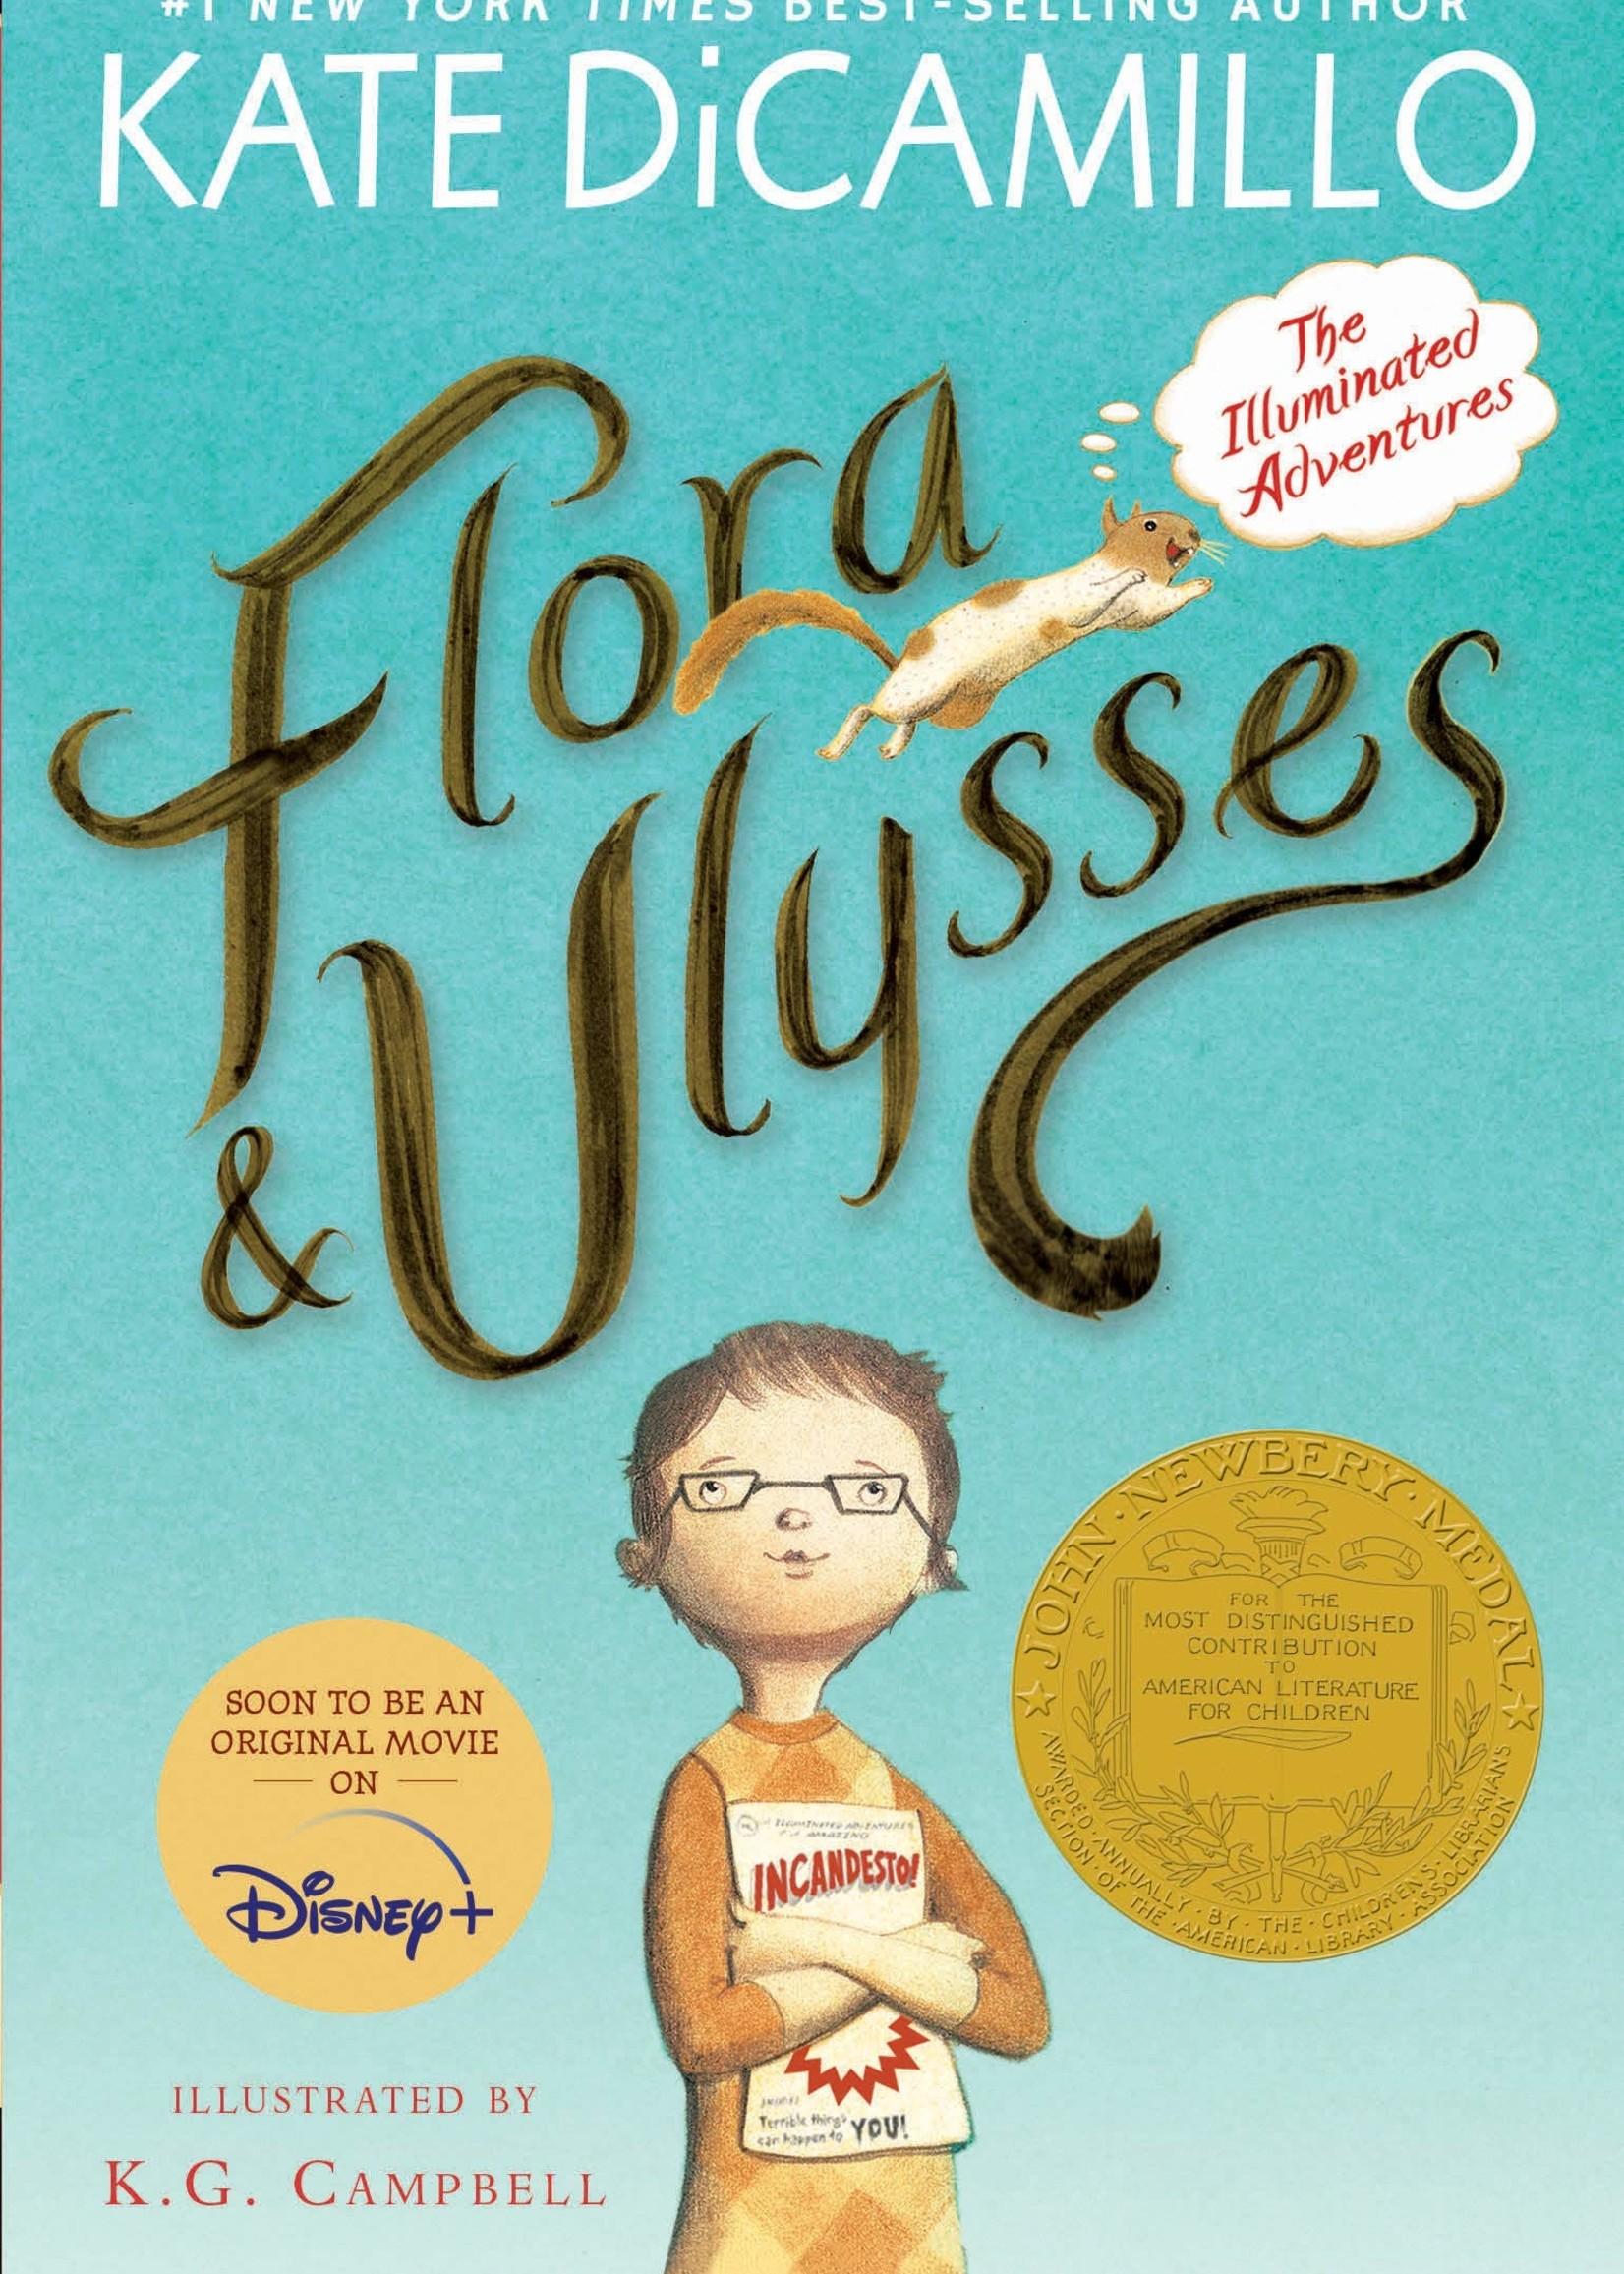 Flora & Ulysses, The Illuminated Adventures - Paperback